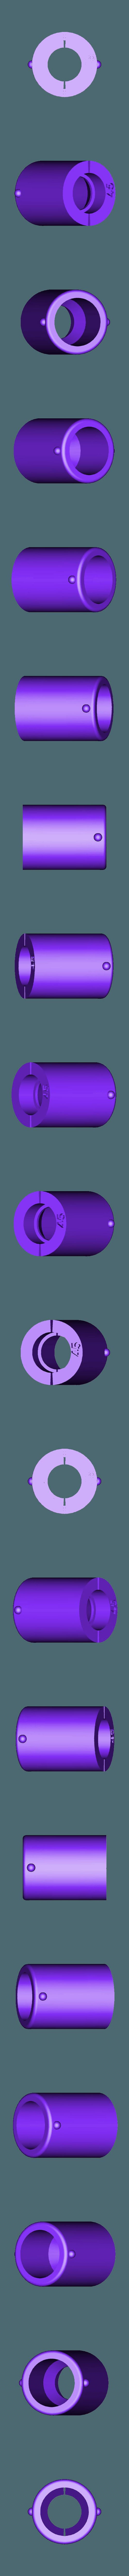 insert.45ACP.simple.stl Download free STL file Bullet puller • 3D printable design, LionFox